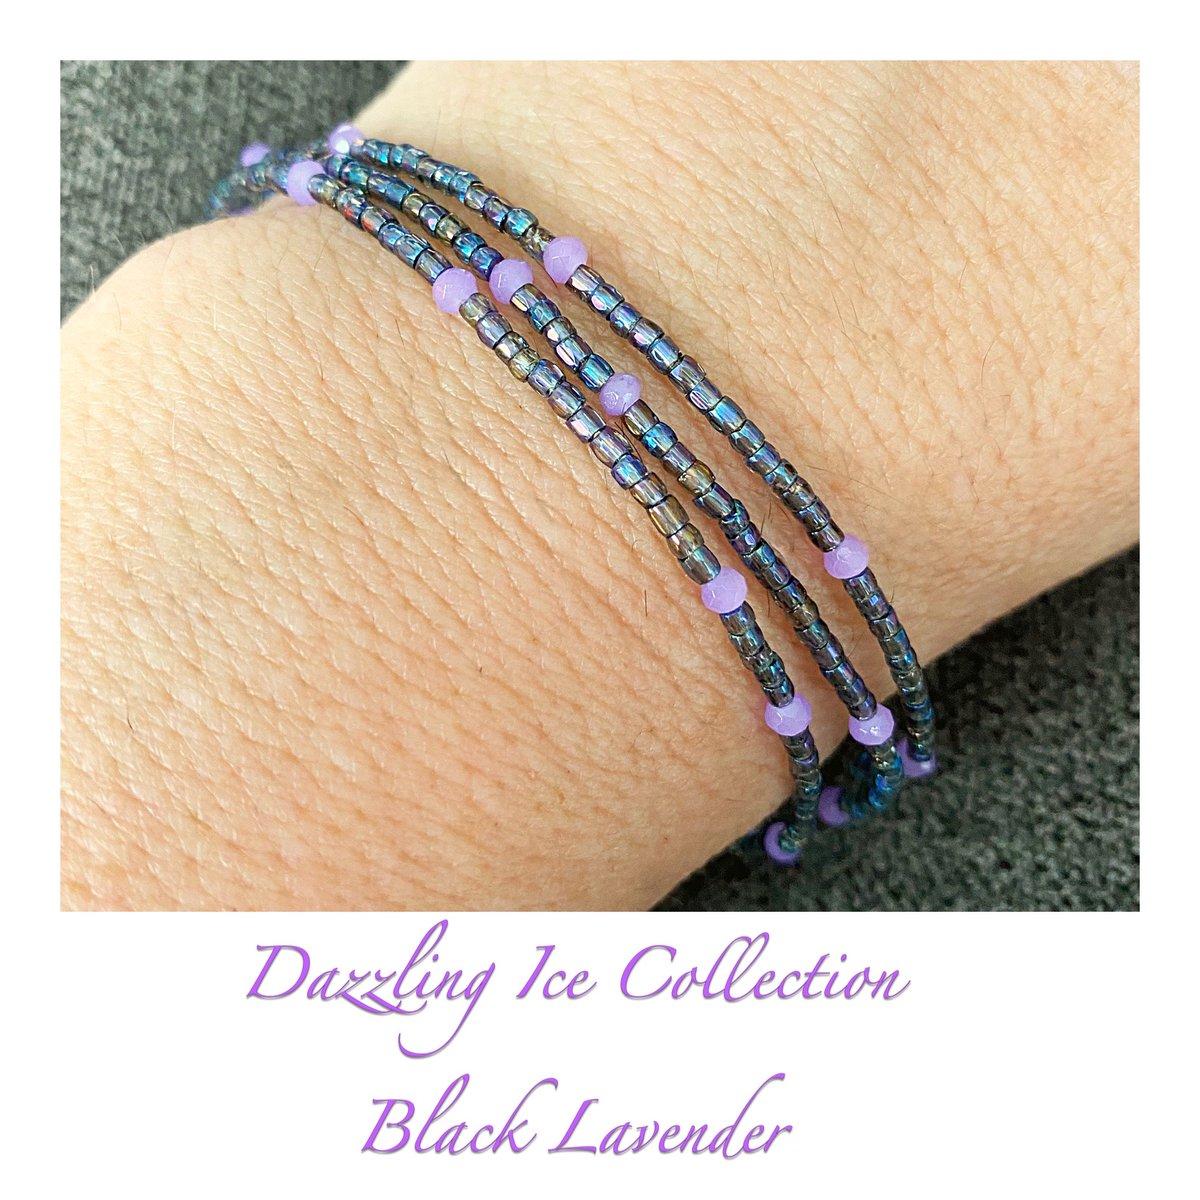 Dazzling Ice Collection ~ Black Lavender Wrap Bracelet https://www.etsy.com/listing/777767858/dazzling-ice-collection-black-lavender… #newarrival #etsy #etsysuccess #lunabyrachel #noclaspjewelry #dazzlingicecollection #shopsmallbiz #standwithsmallpic.twitter.com/1VkdSVQPwy